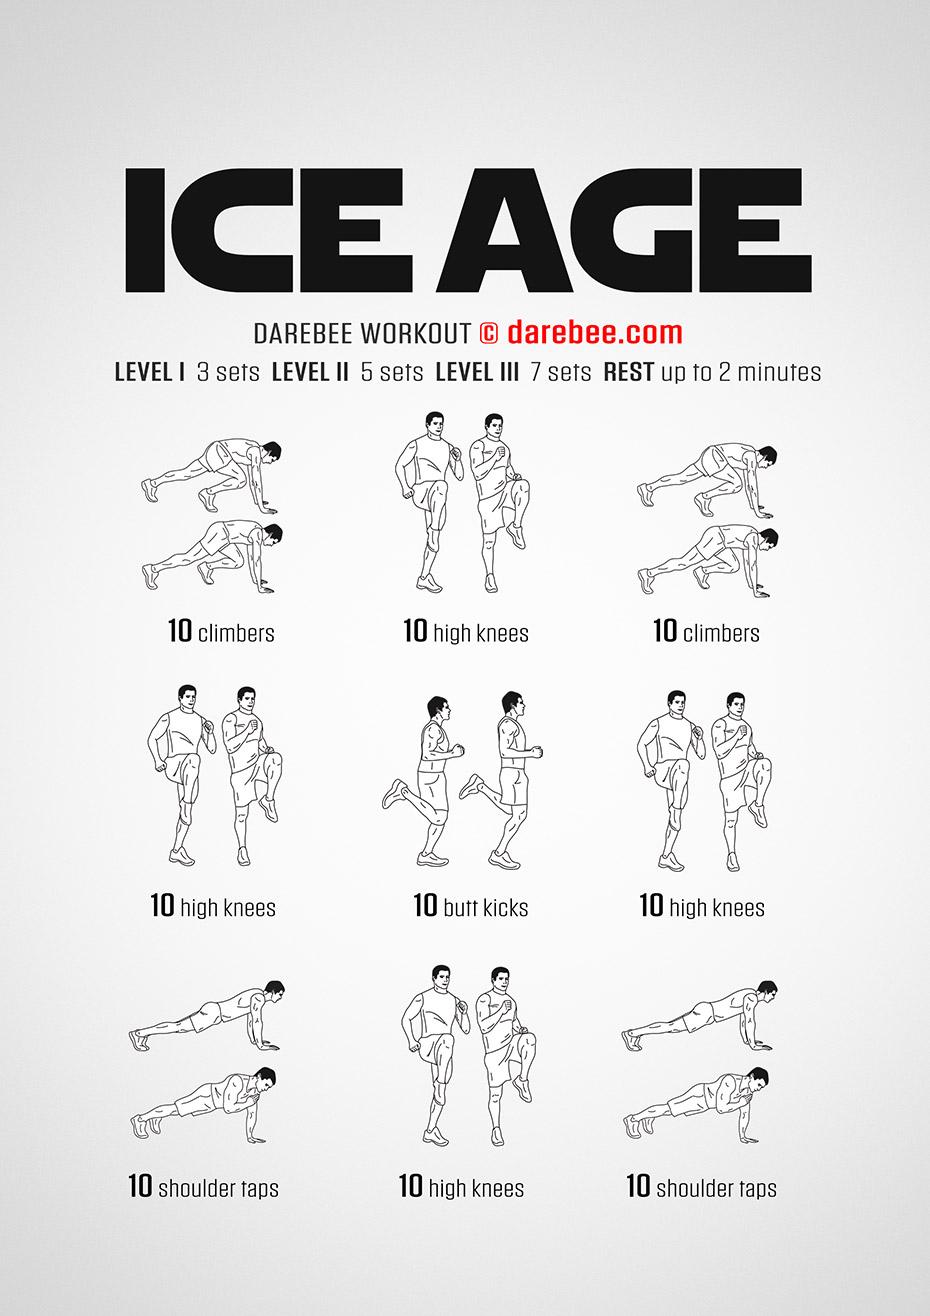 DEPORTE EN CASA - Página 4 Ice-age-workout